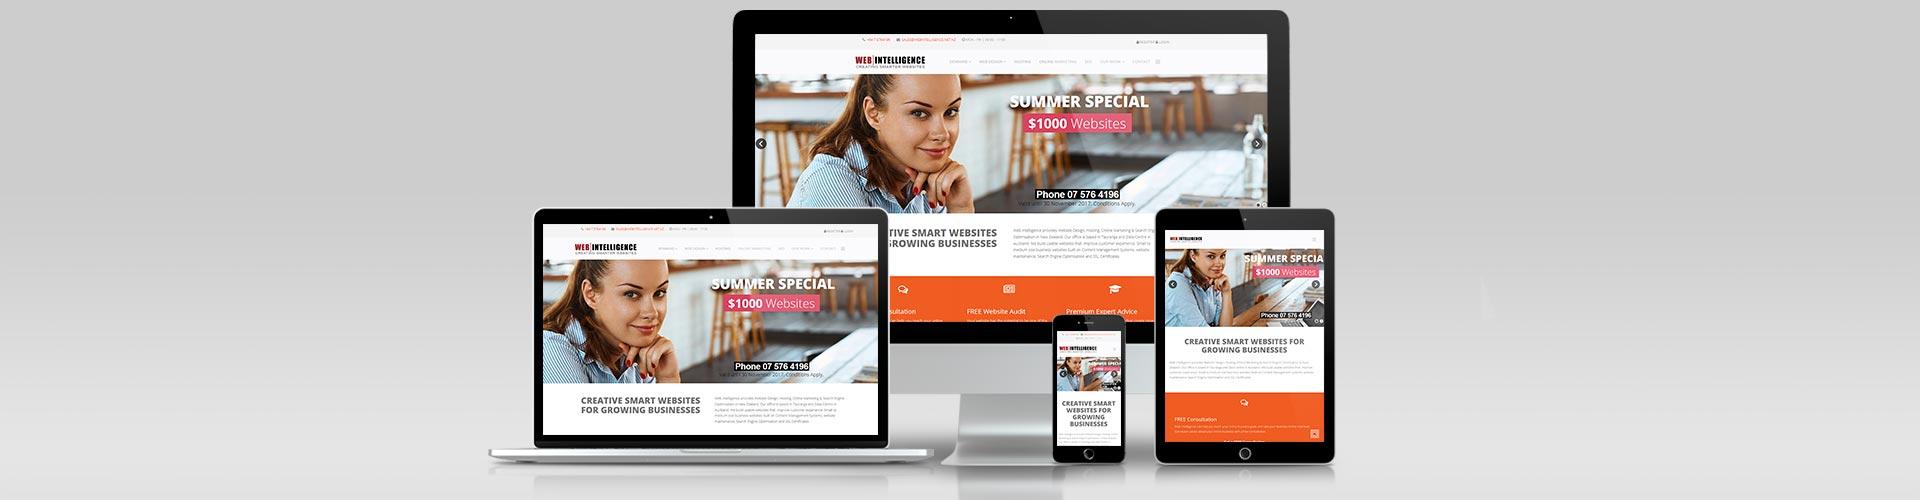 banner-responsize-website-design-home